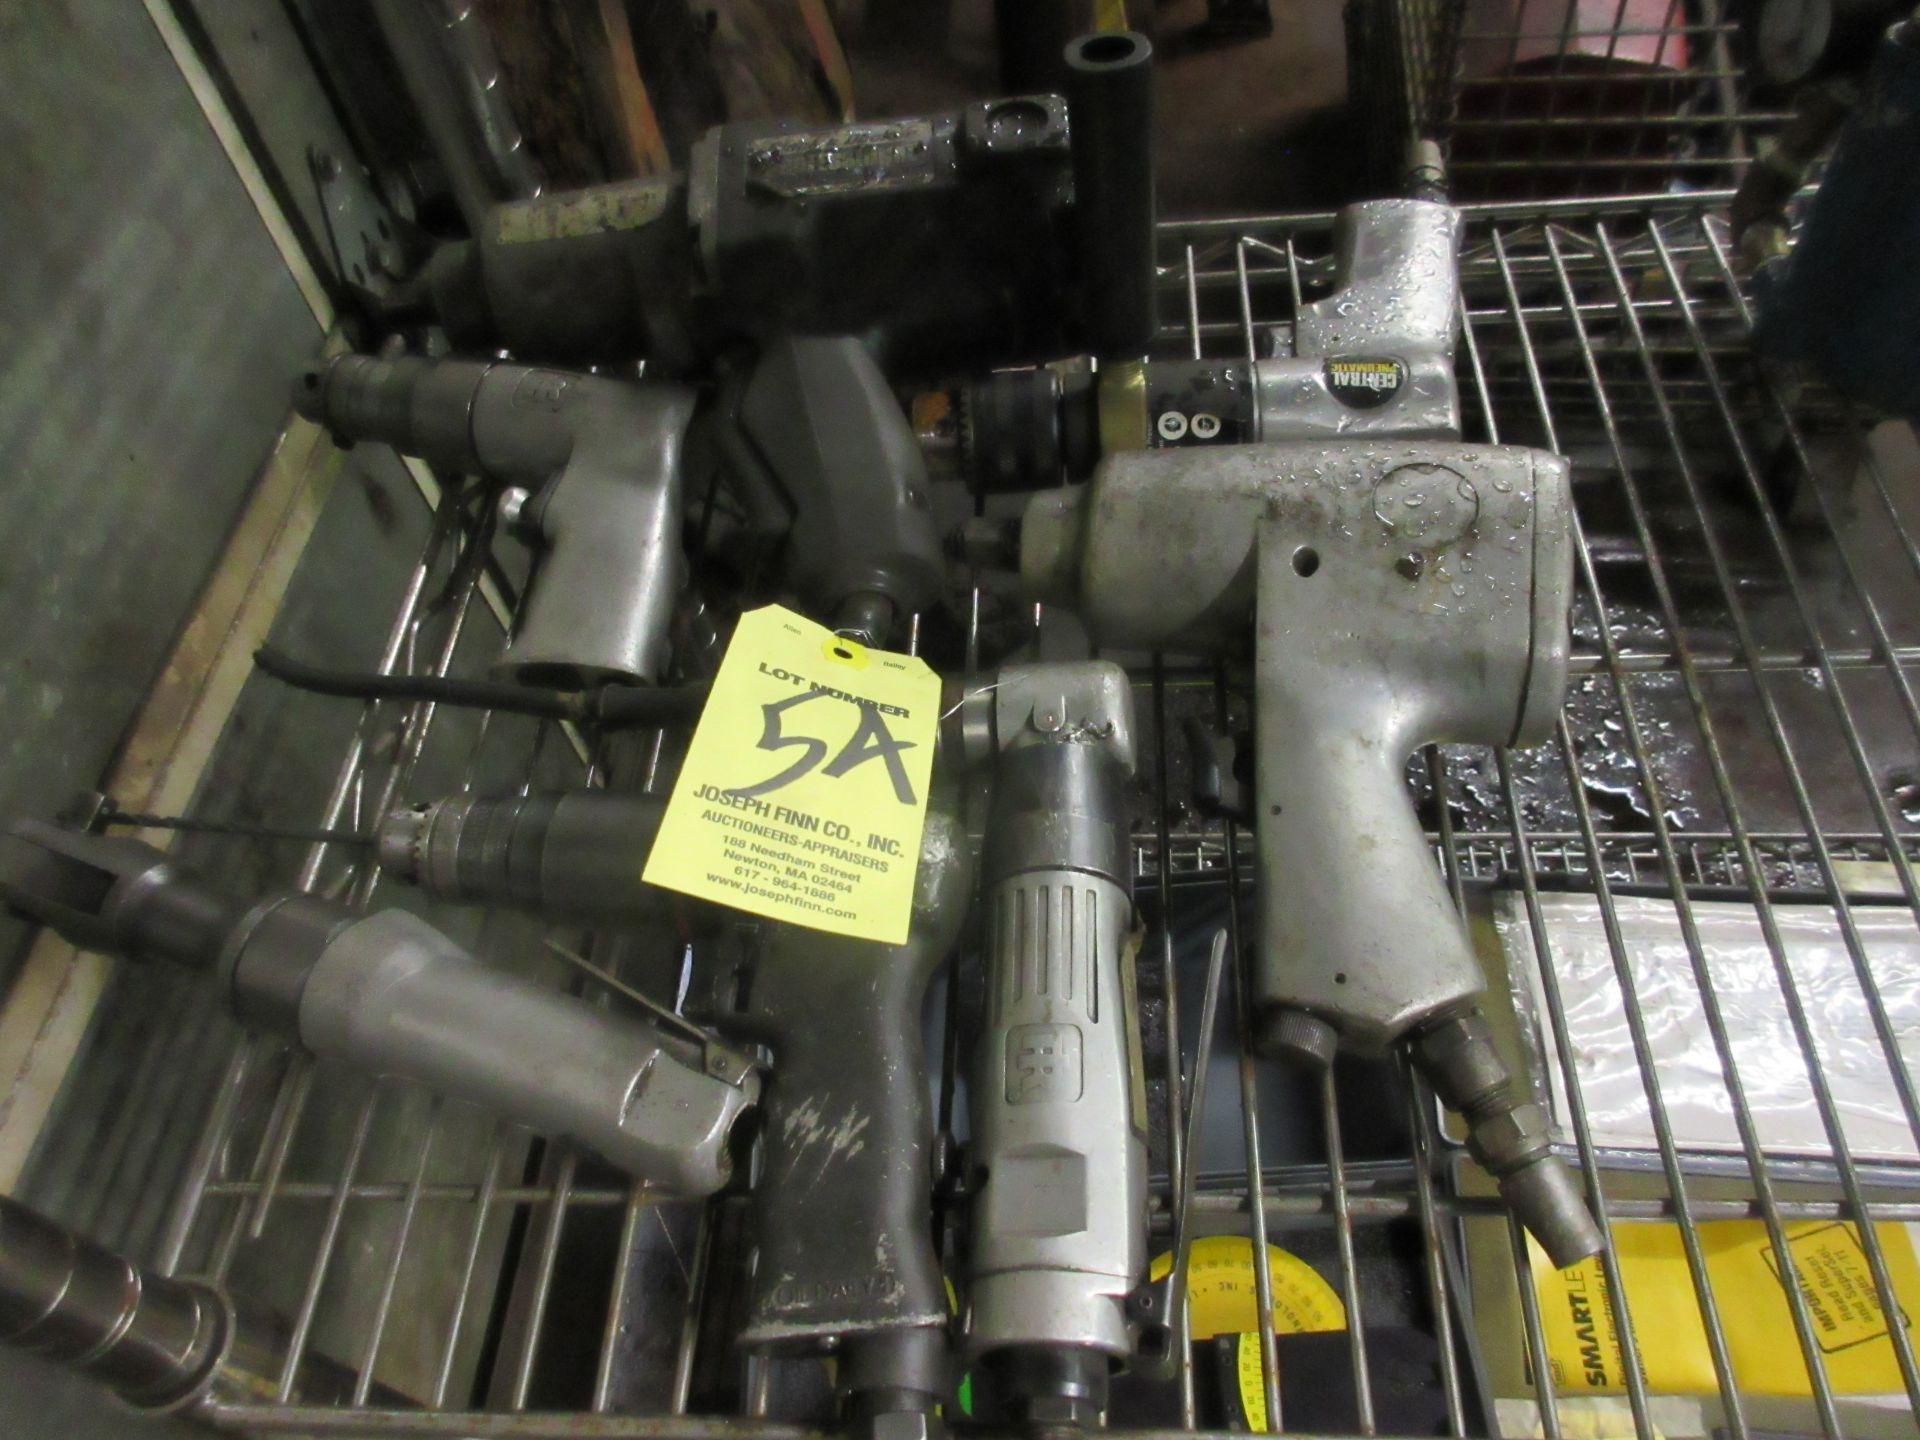 LOT (7) Asst. Pneumatic Drills & Wrenches